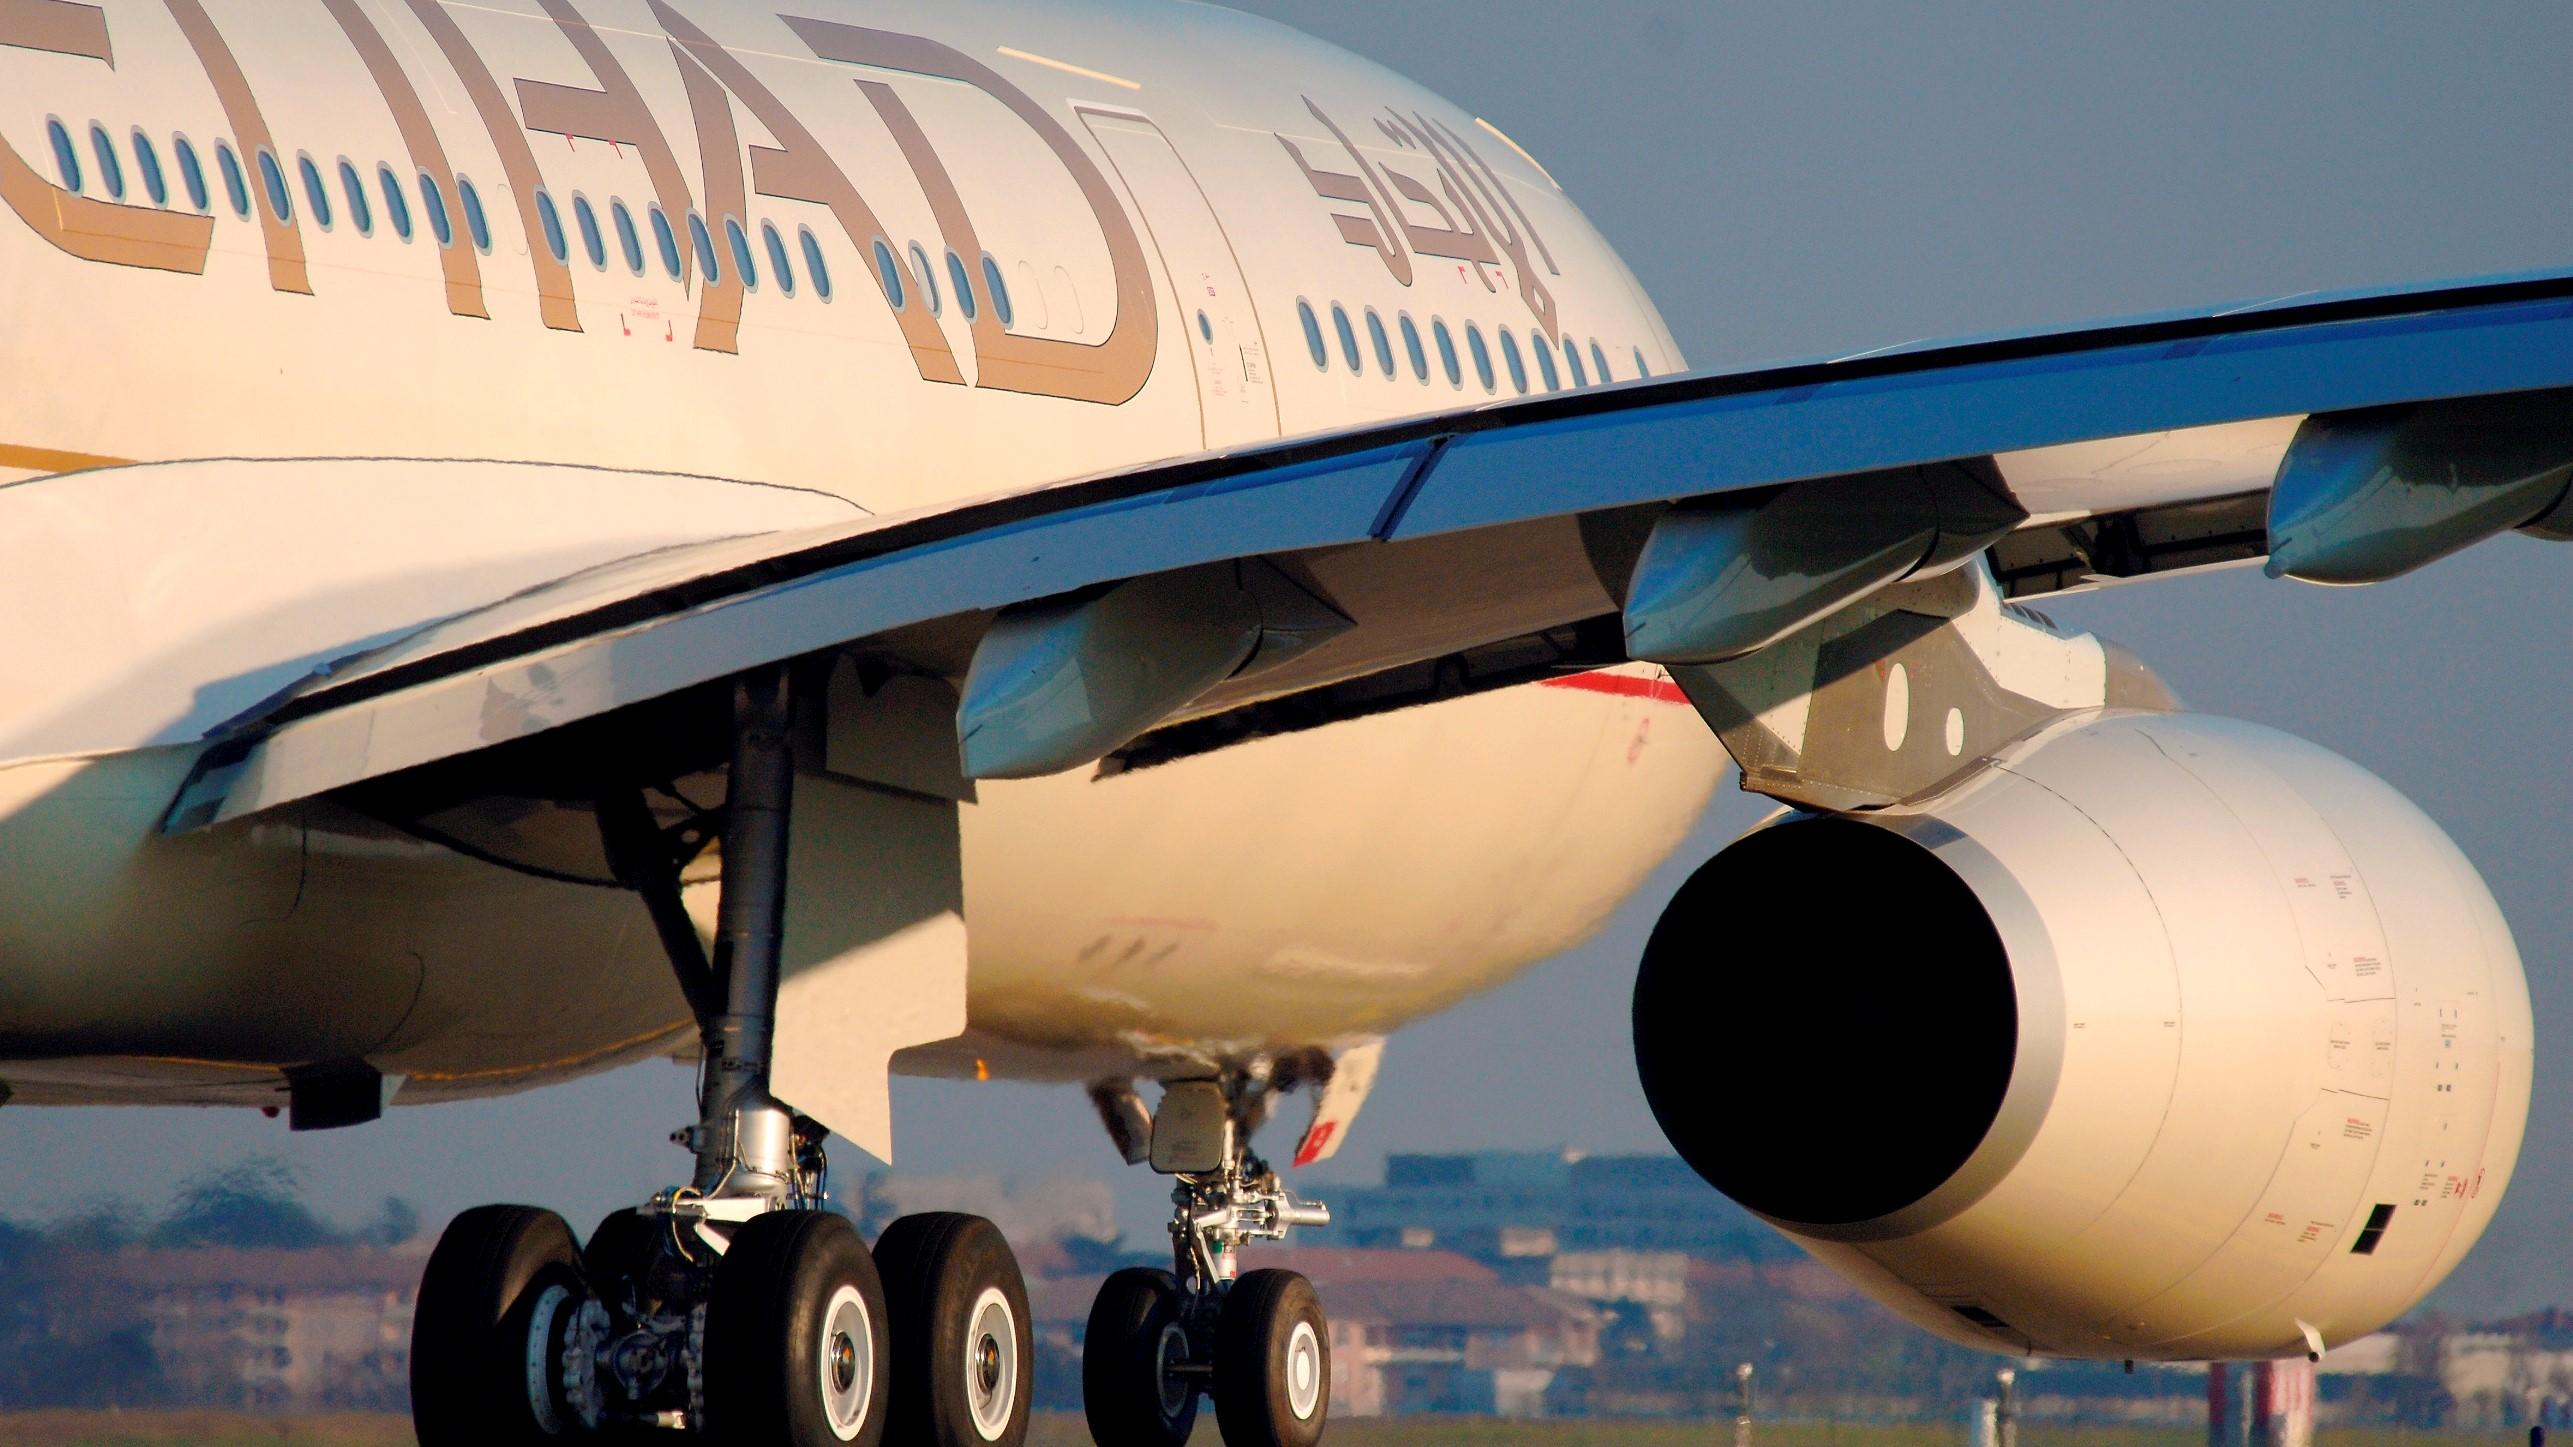 Etihad Airways reporting $ 1.28 billion loss in 2018 1